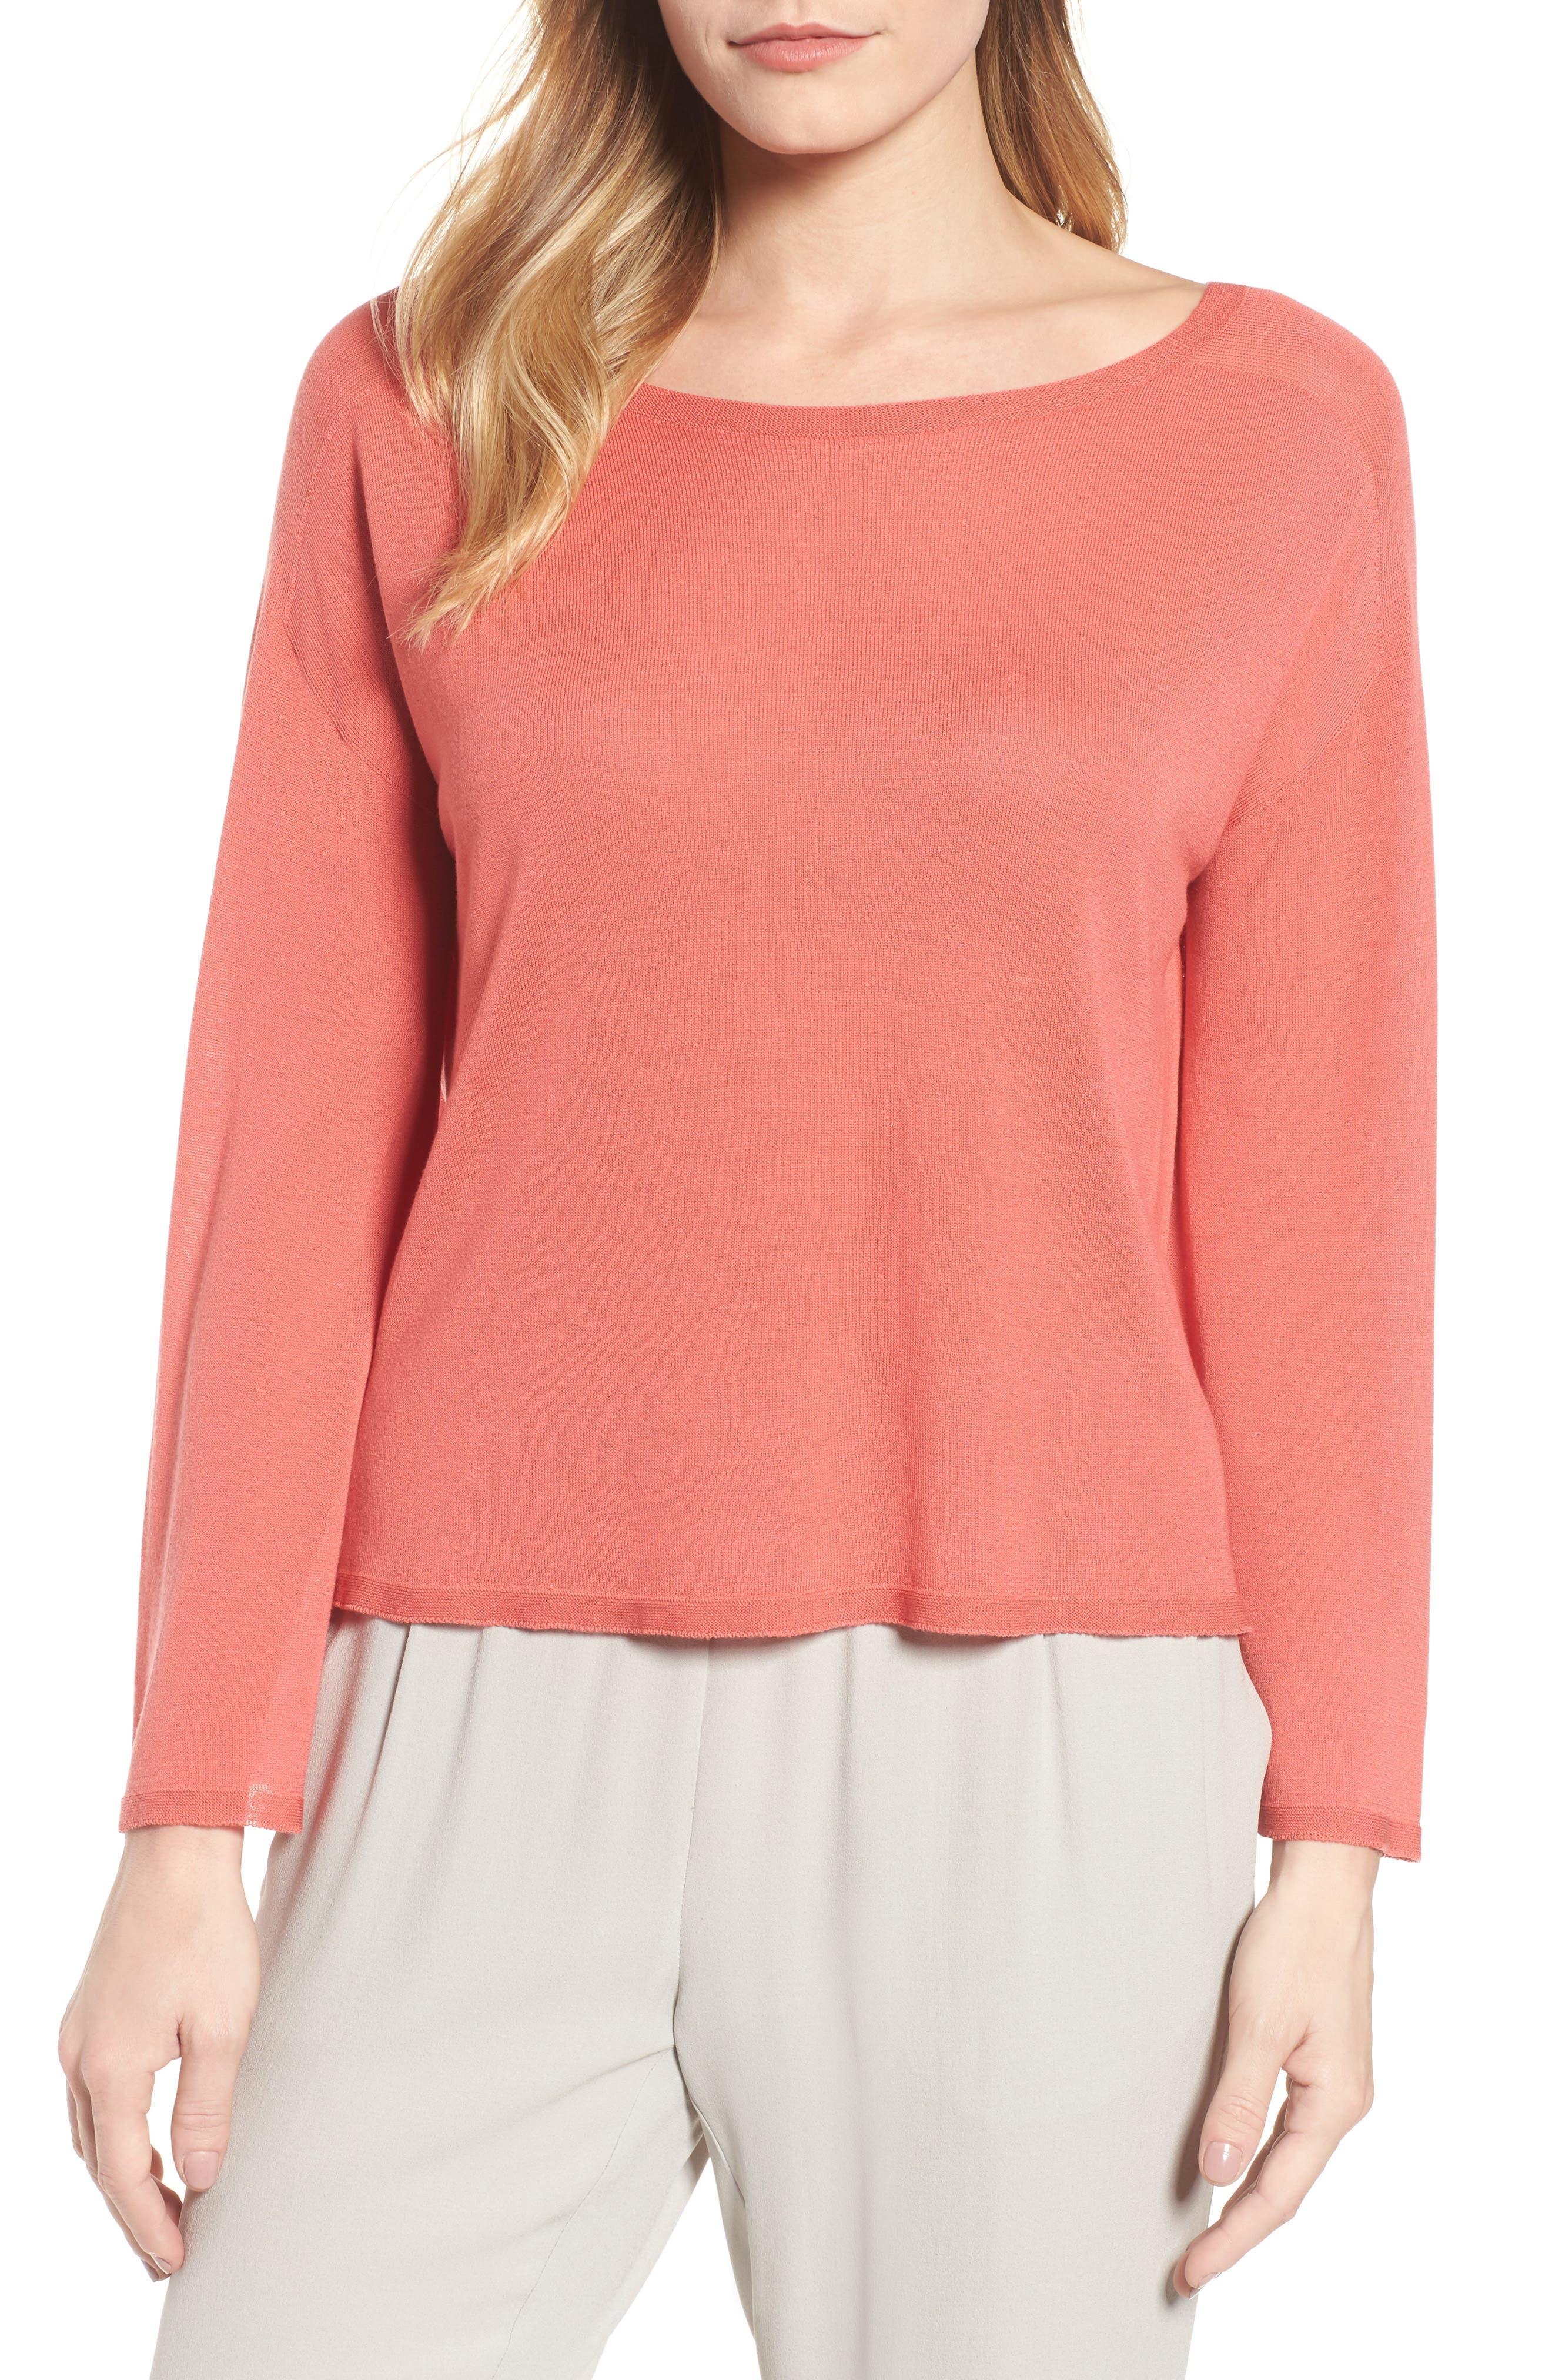 Tencel<sup>®</sup> Lyocell Knit Sweater,                             Main thumbnail 3, color,